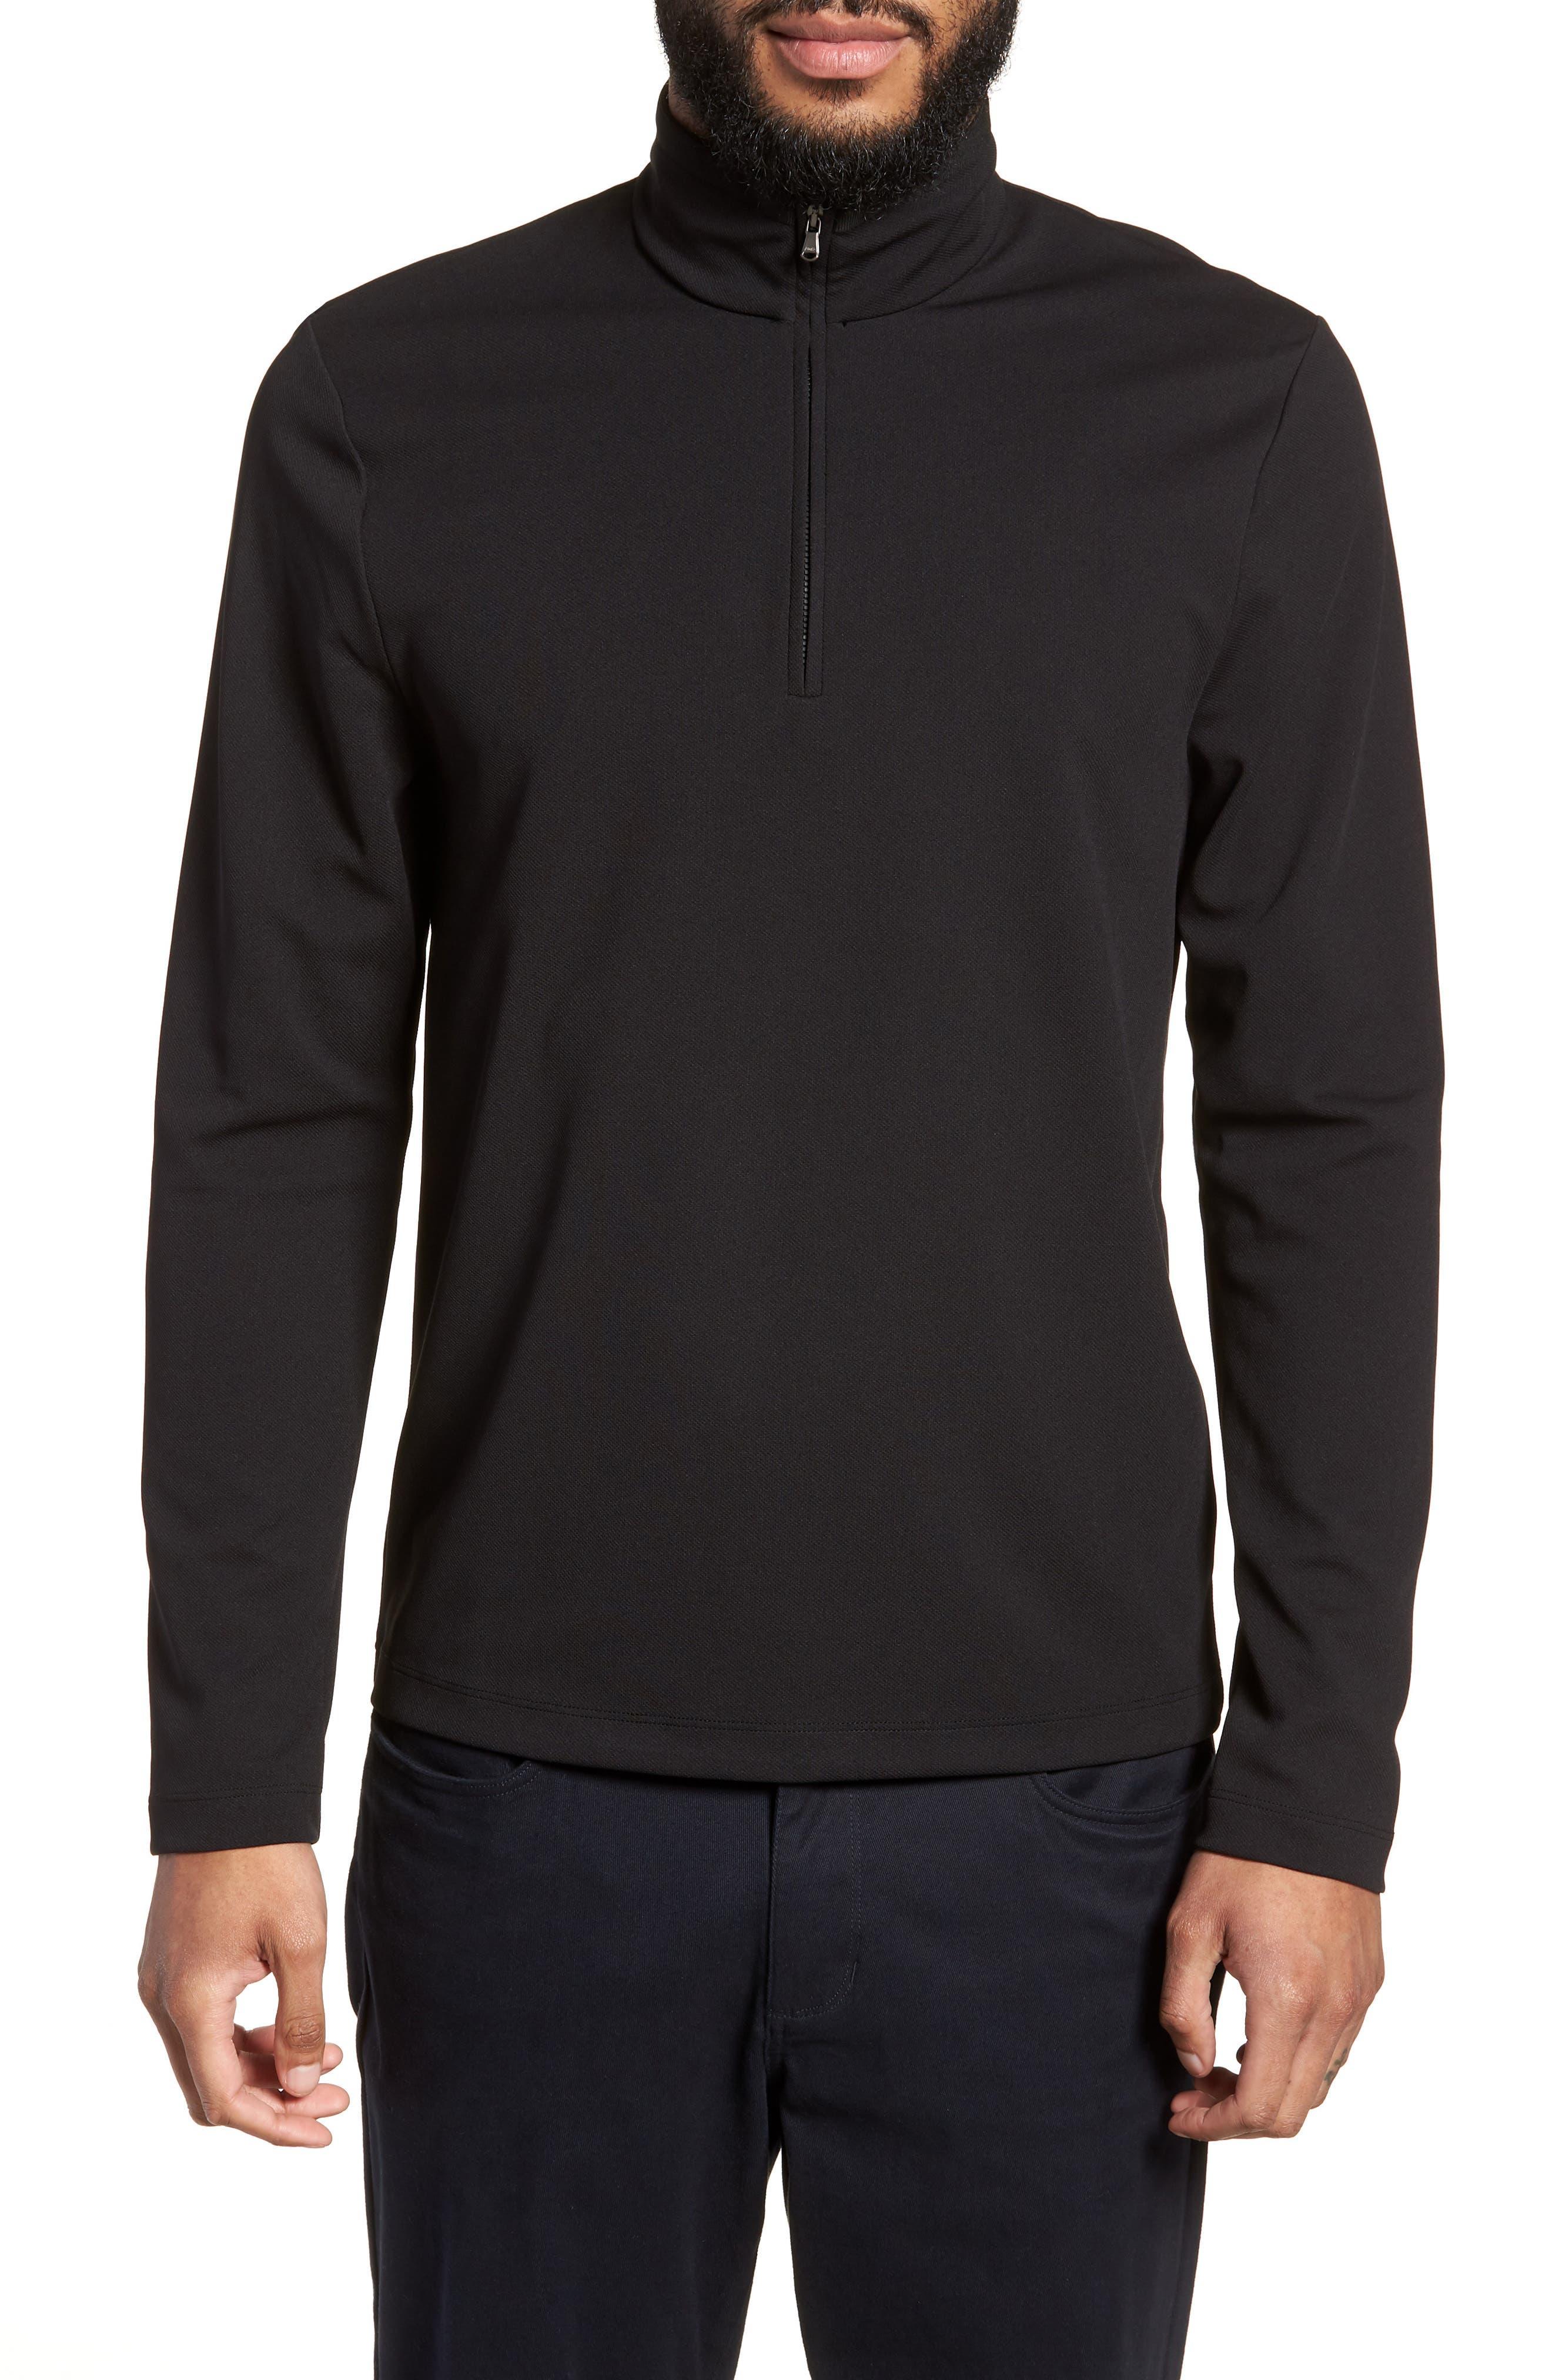 Performance Quarter Zip Pullover,                             Main thumbnail 1, color,                             Black/ Black